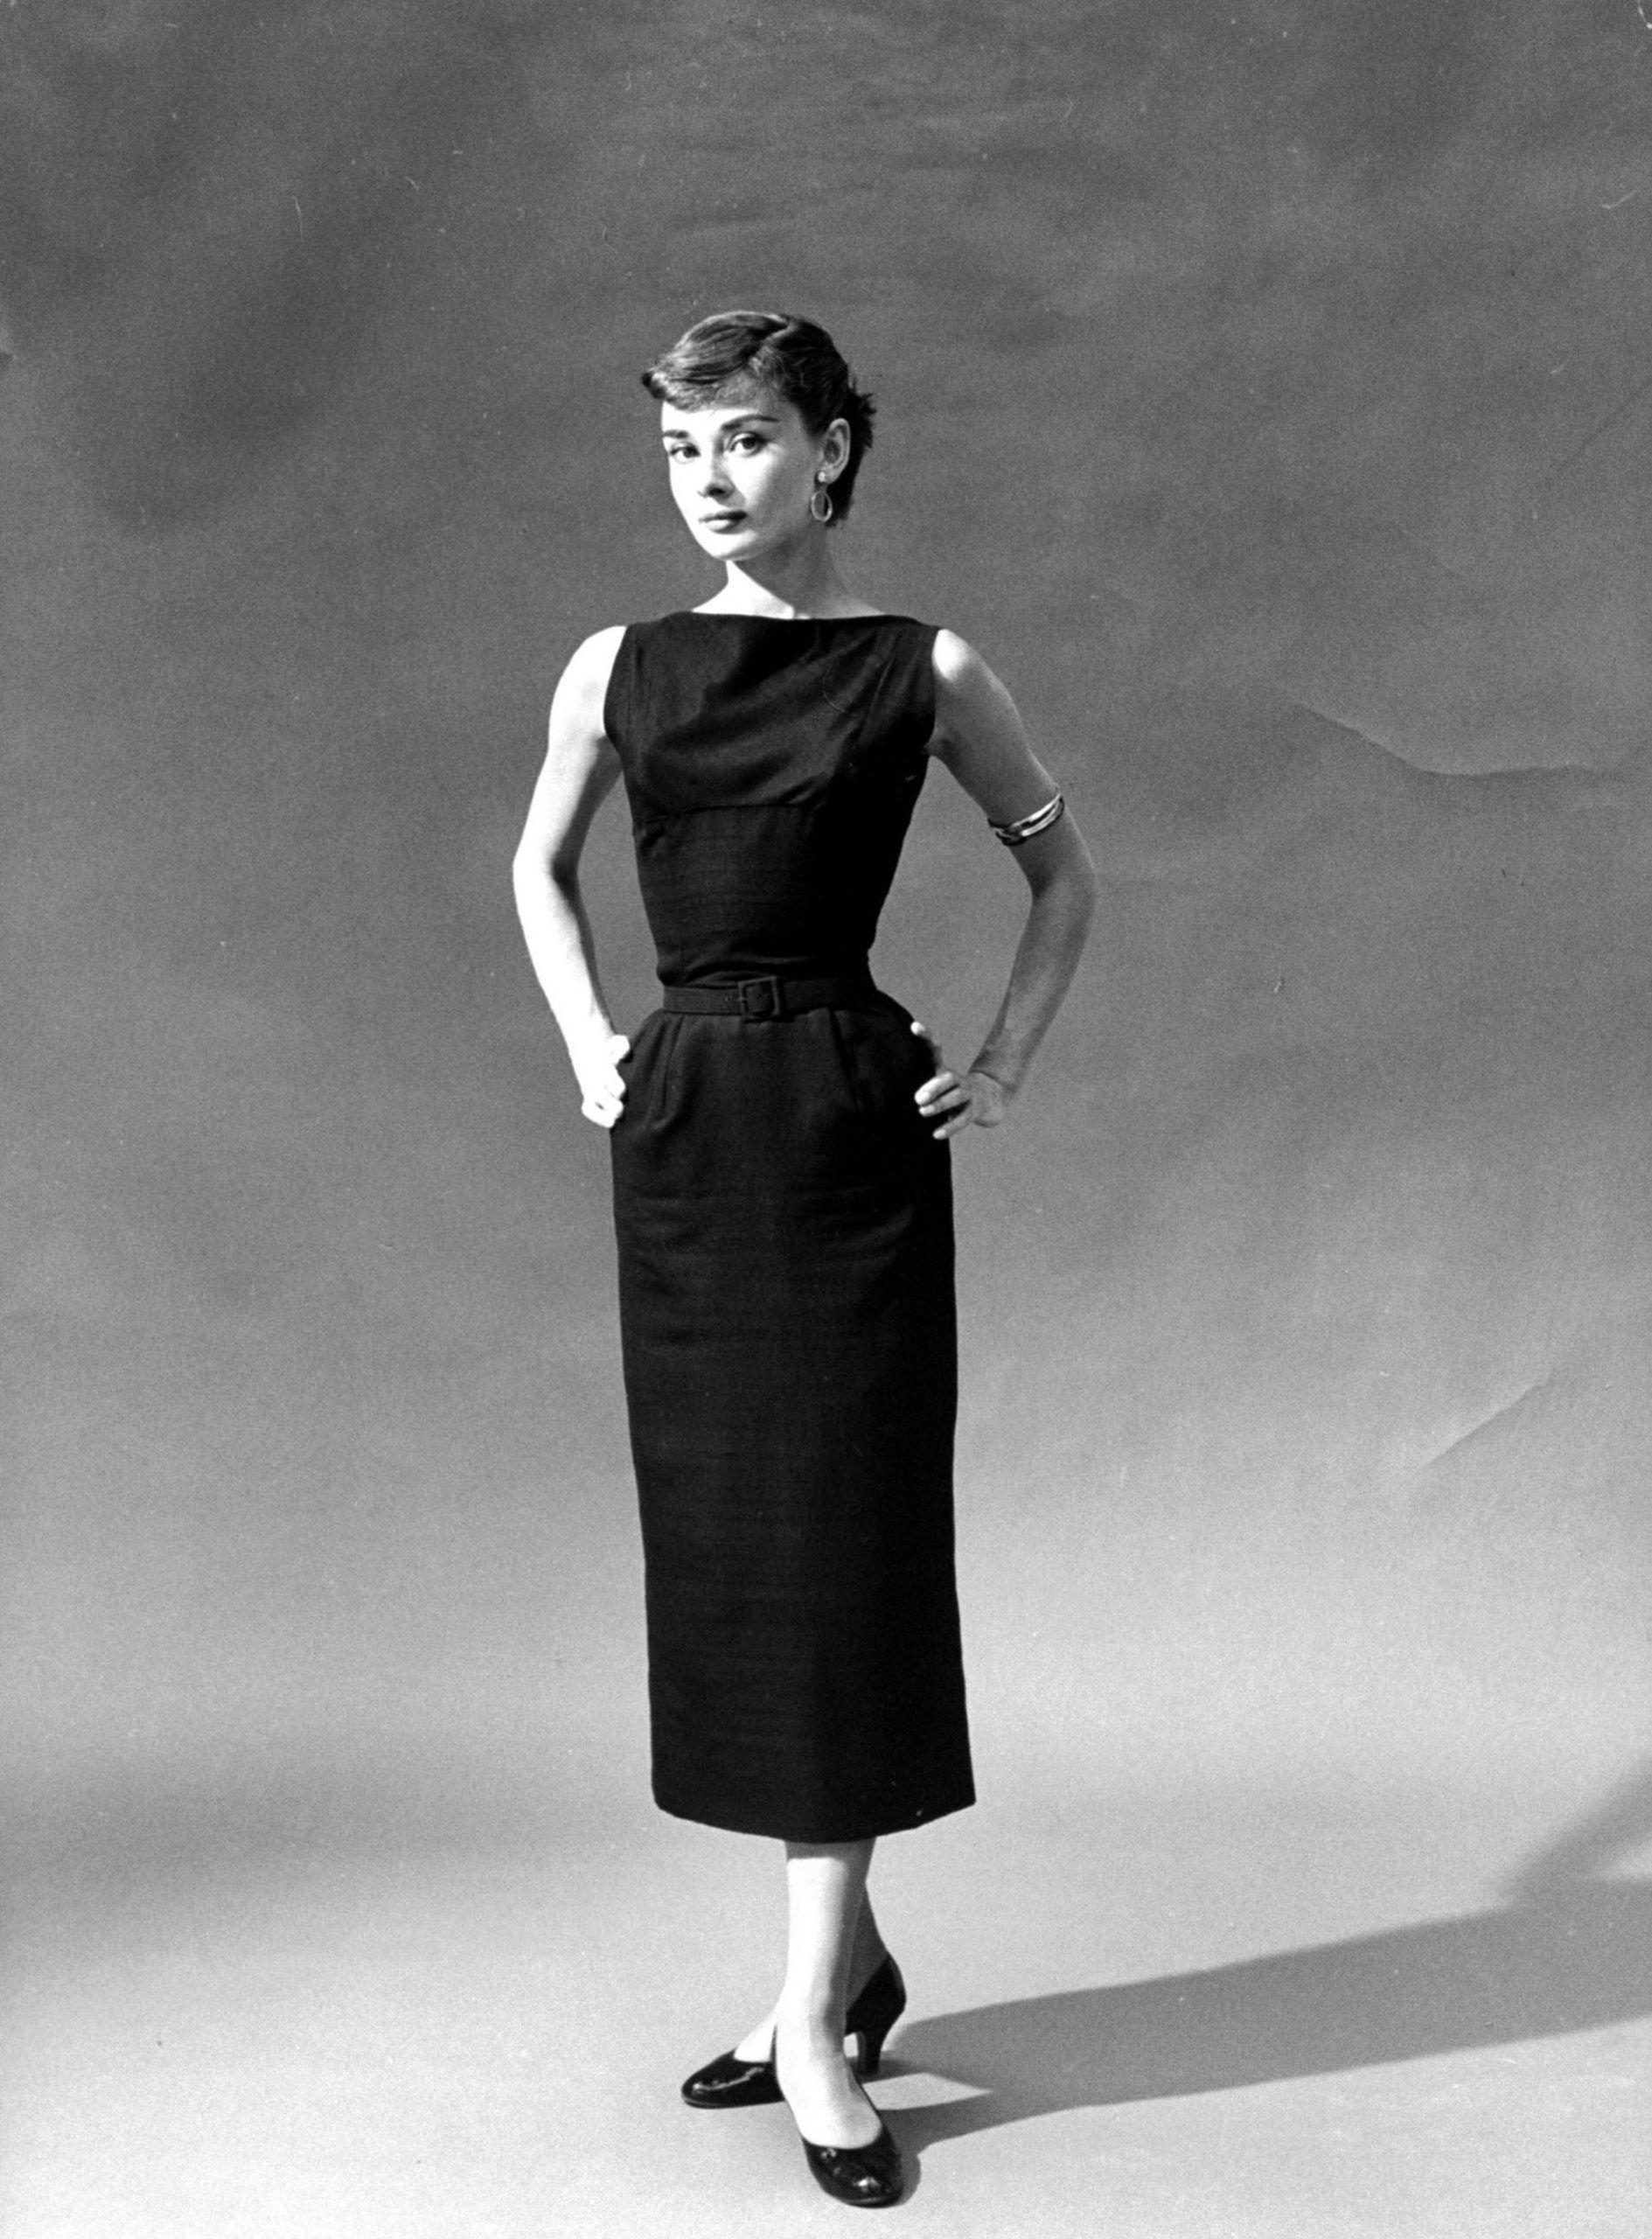 Audrey hepburns little black dress hawked off at auction nude (63 photos), Selfie Celebrites fotos